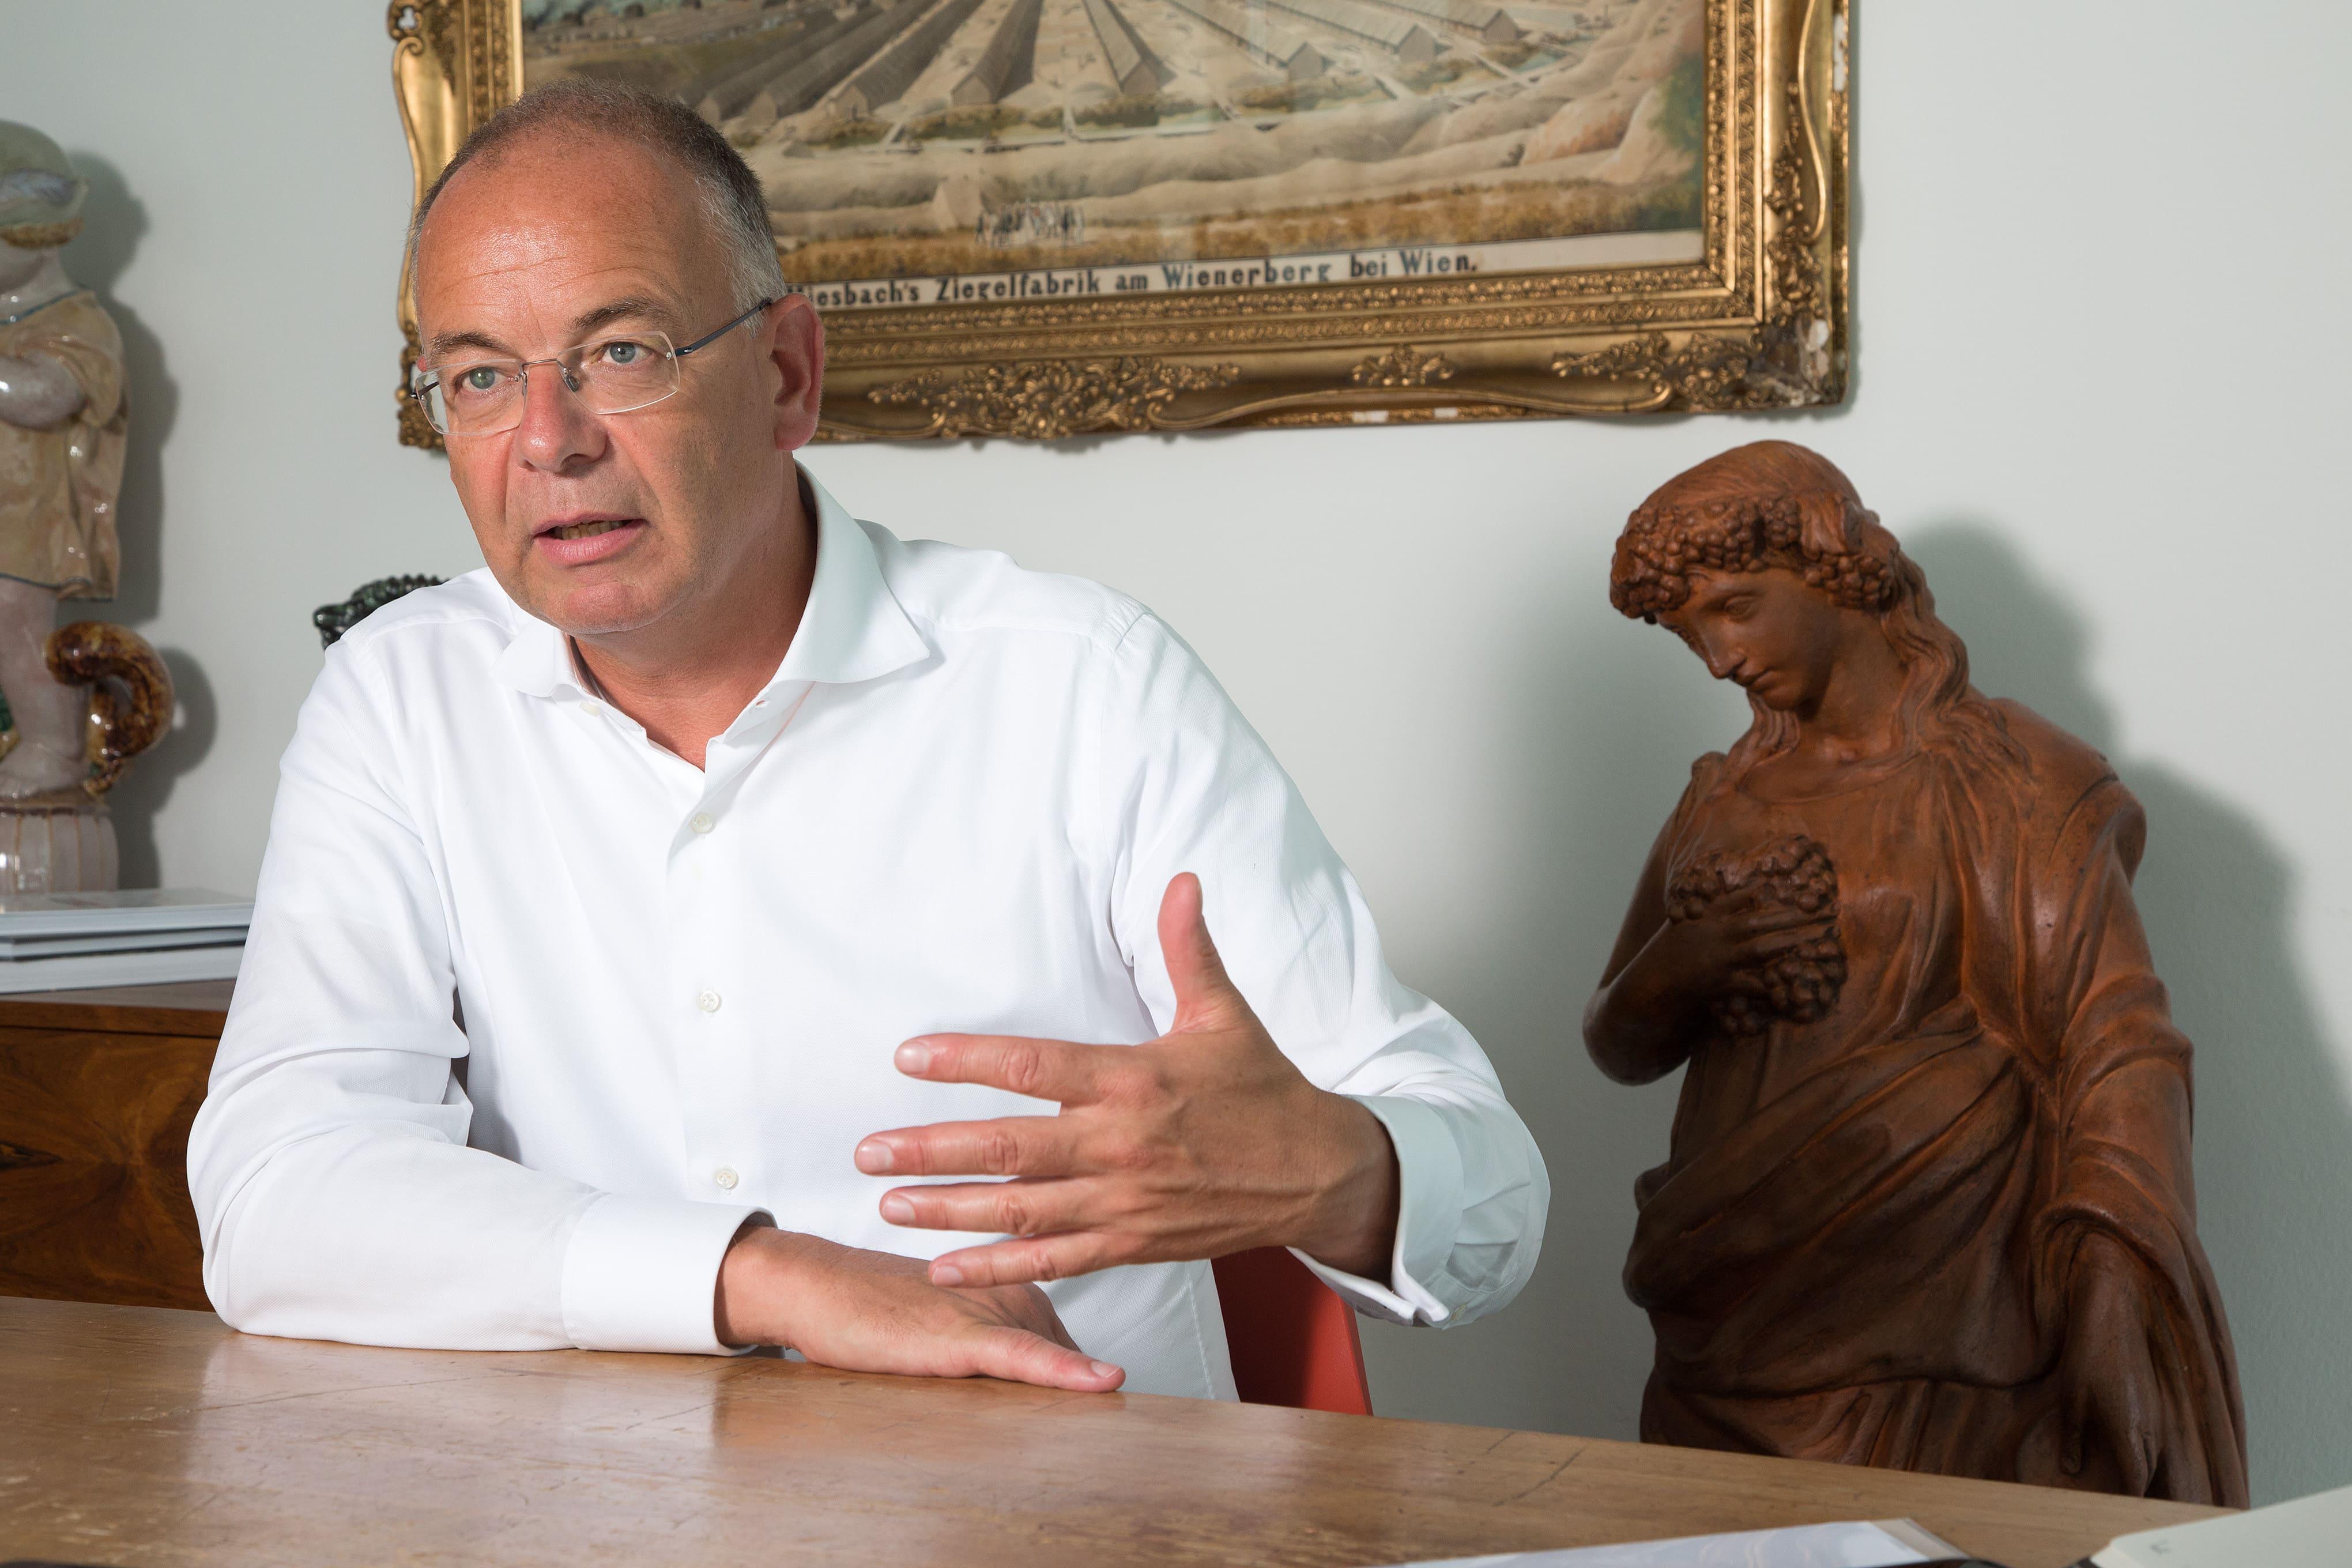 Wienerberger berichtet trotz Covid-19 solide Halbjahresergebnisse 2020